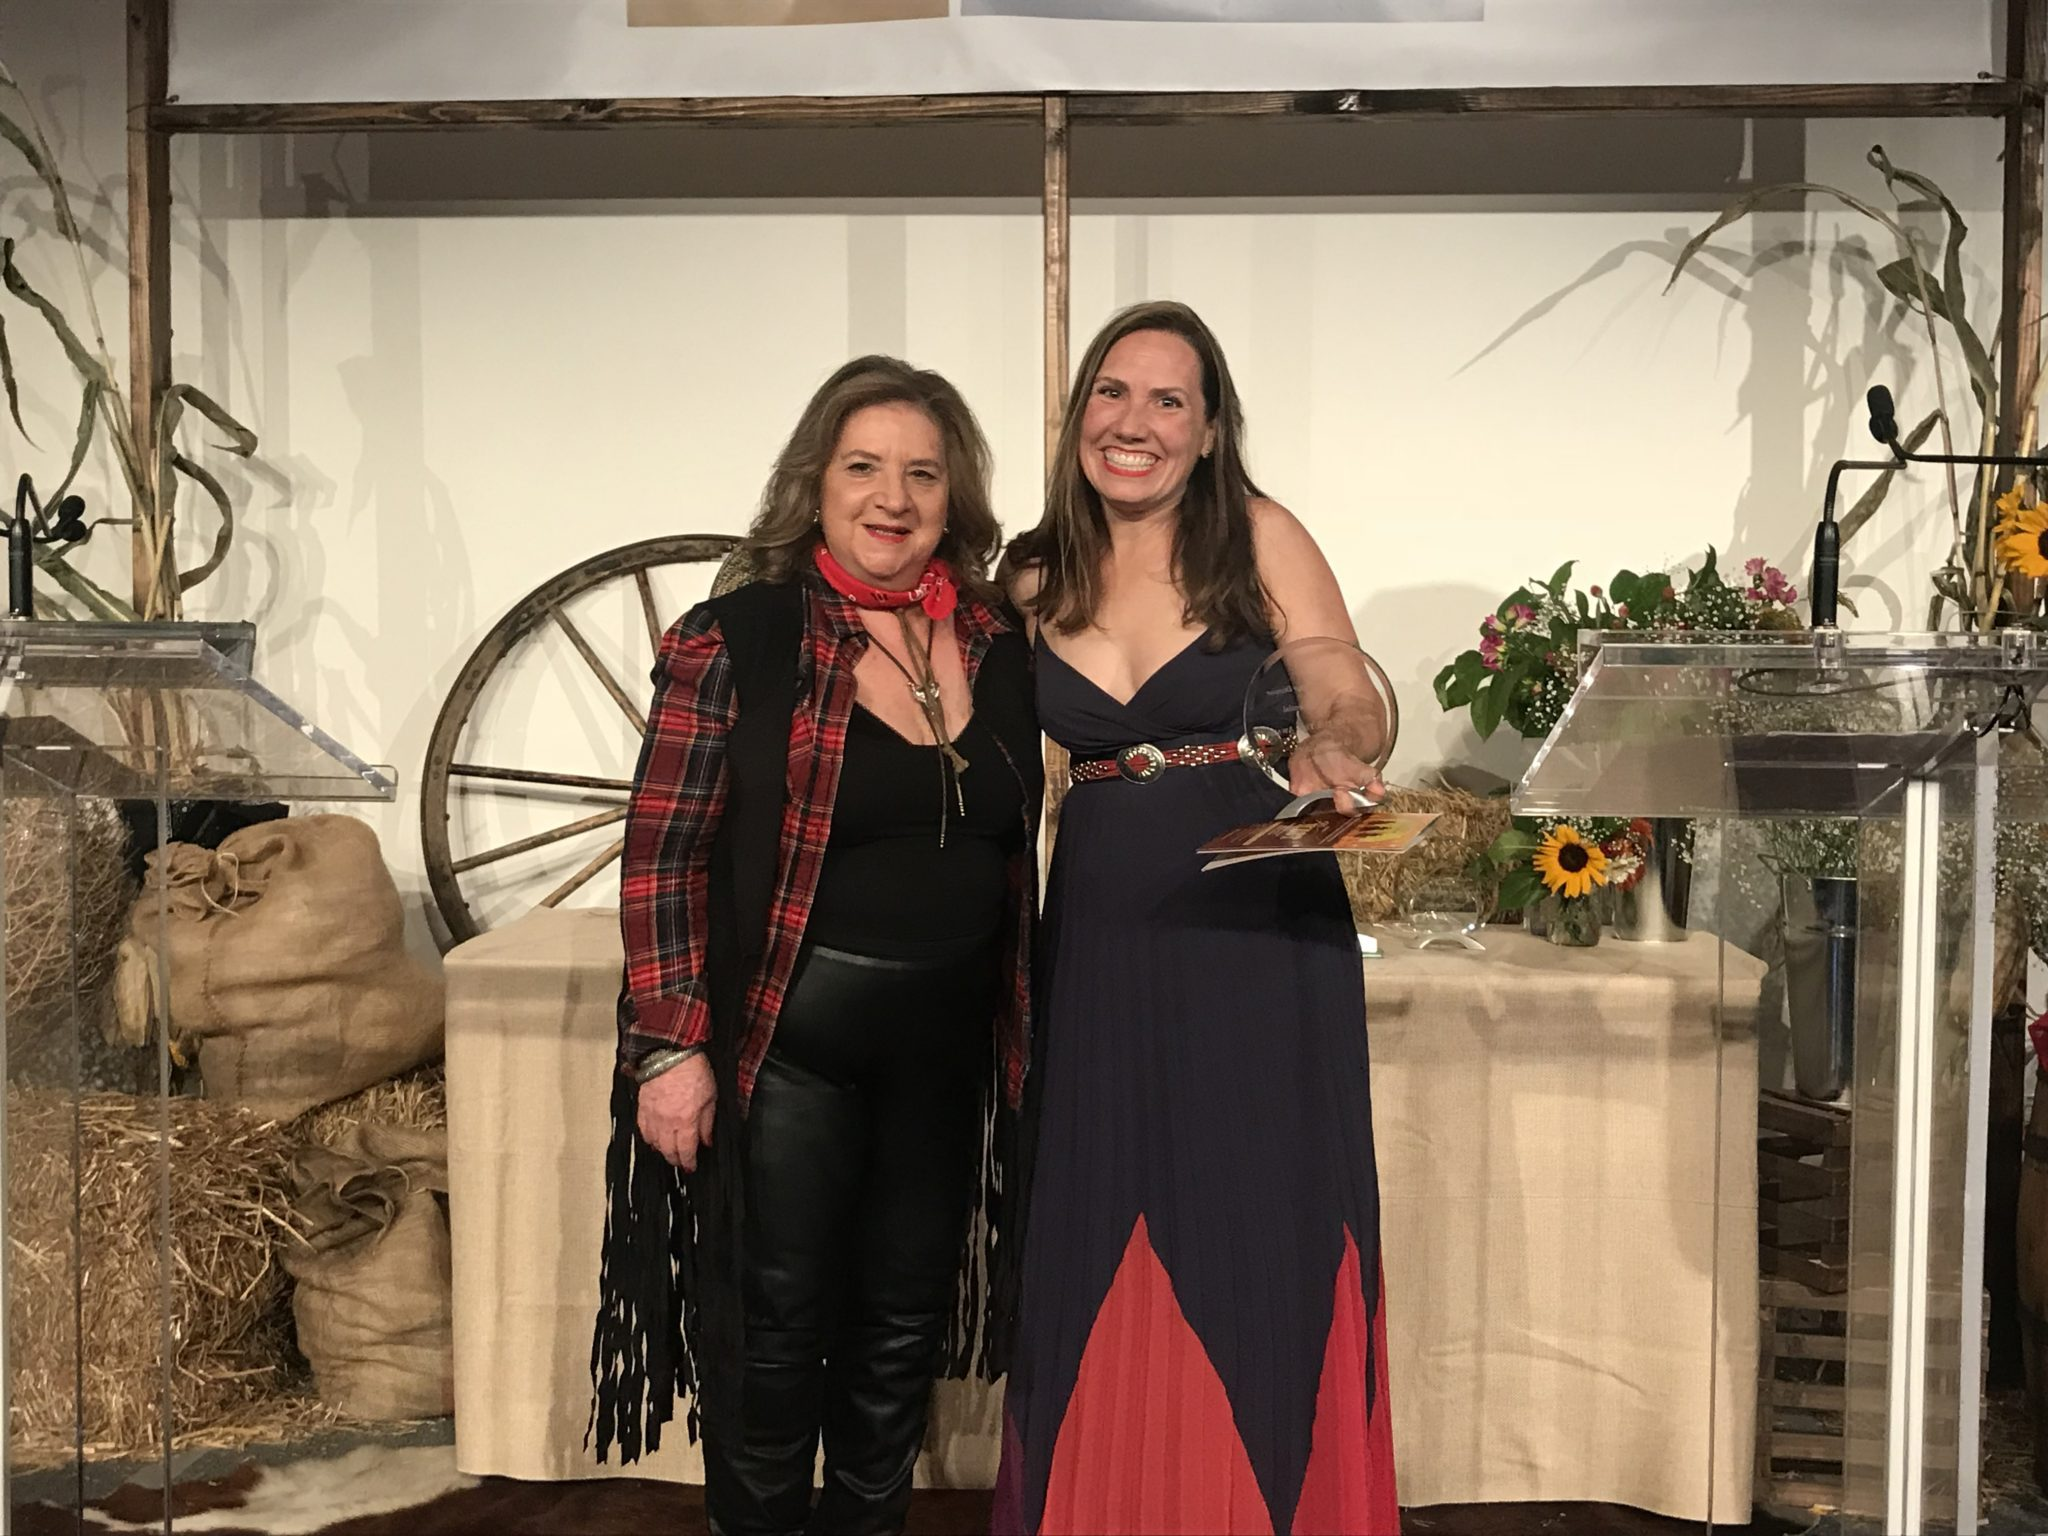 REBNY award winner Joanna Mayfield Marks and Corinne Pulitzer.